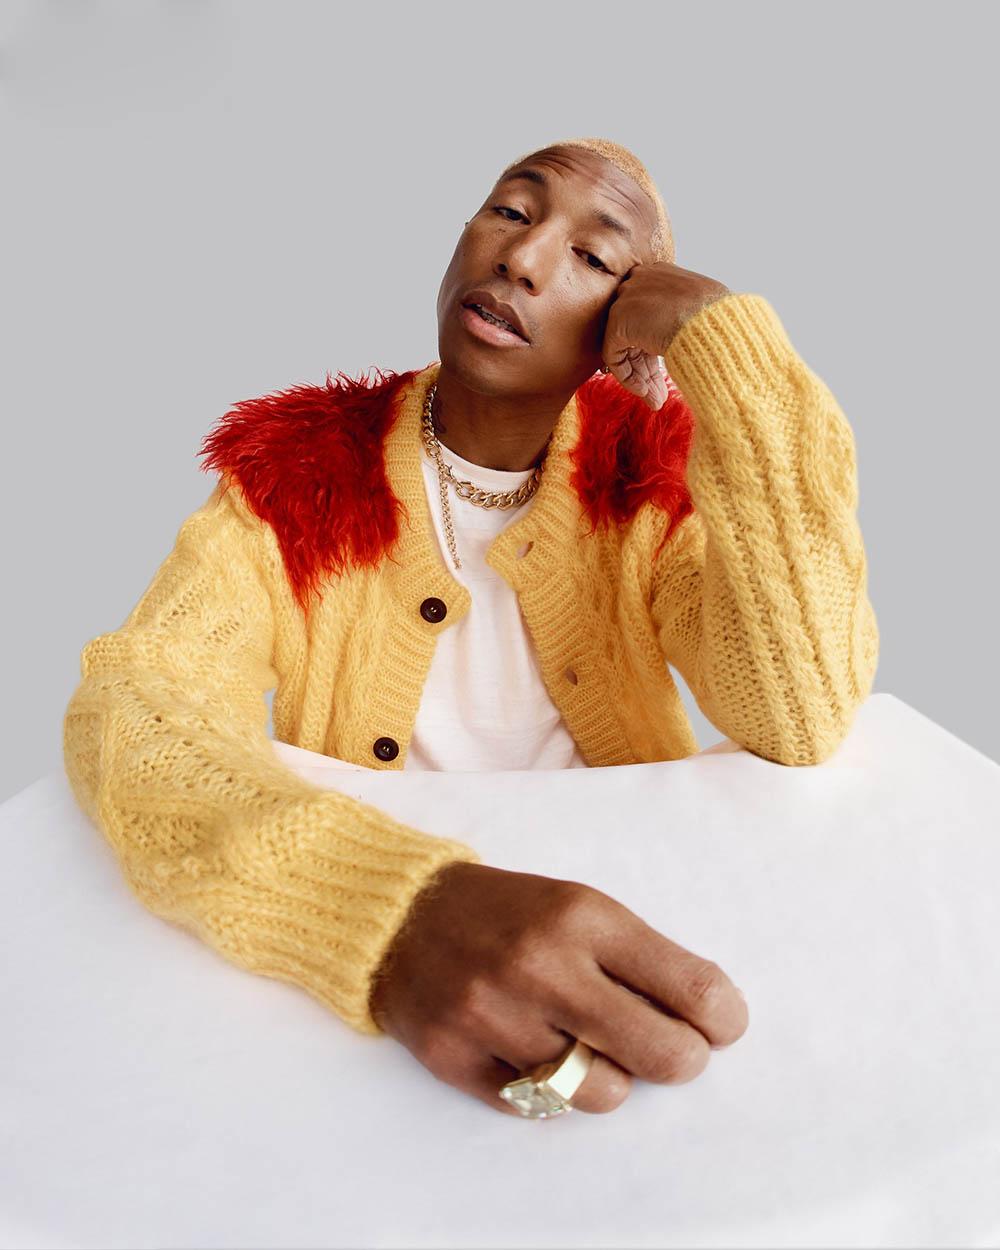 Pharrell Williams covers GQ USA November 2019 Micaiah Carter